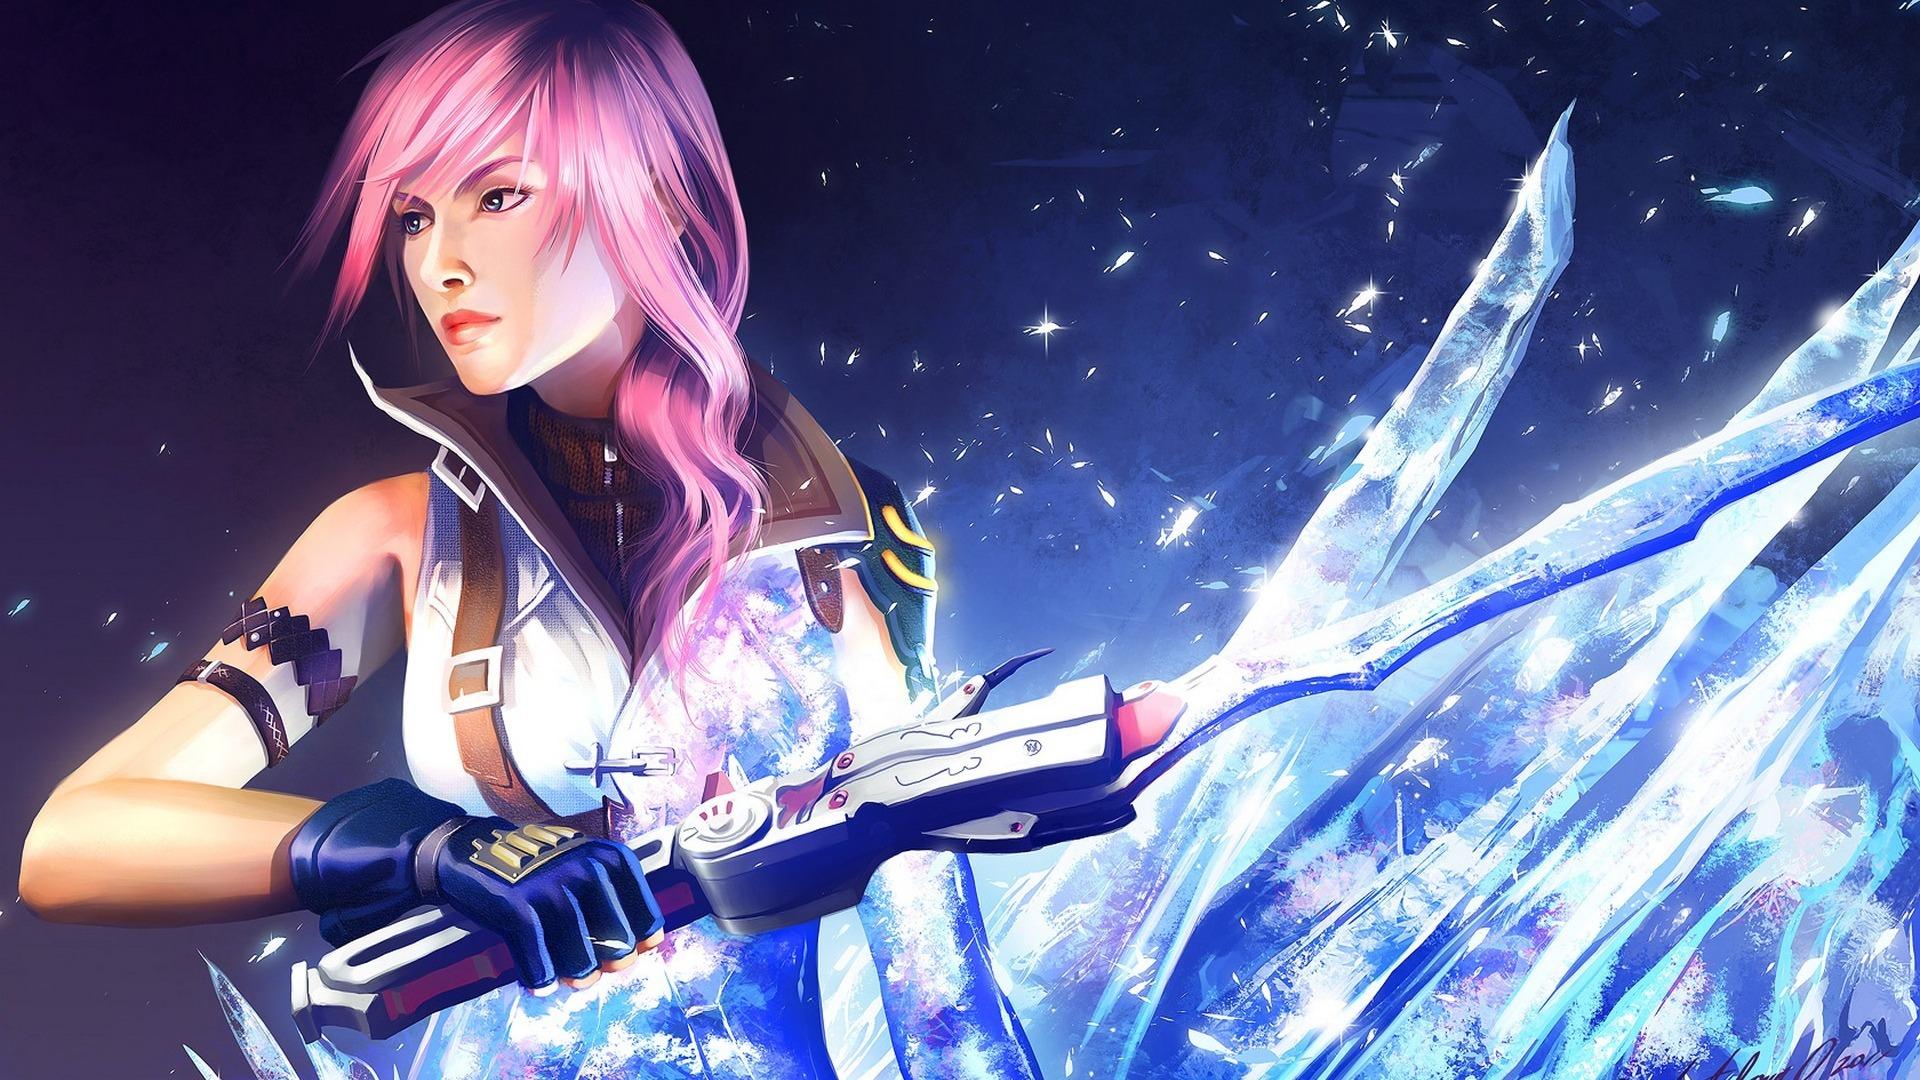 Wallpaper Anime Final Fantasy Xiii Guitarist Art Girl